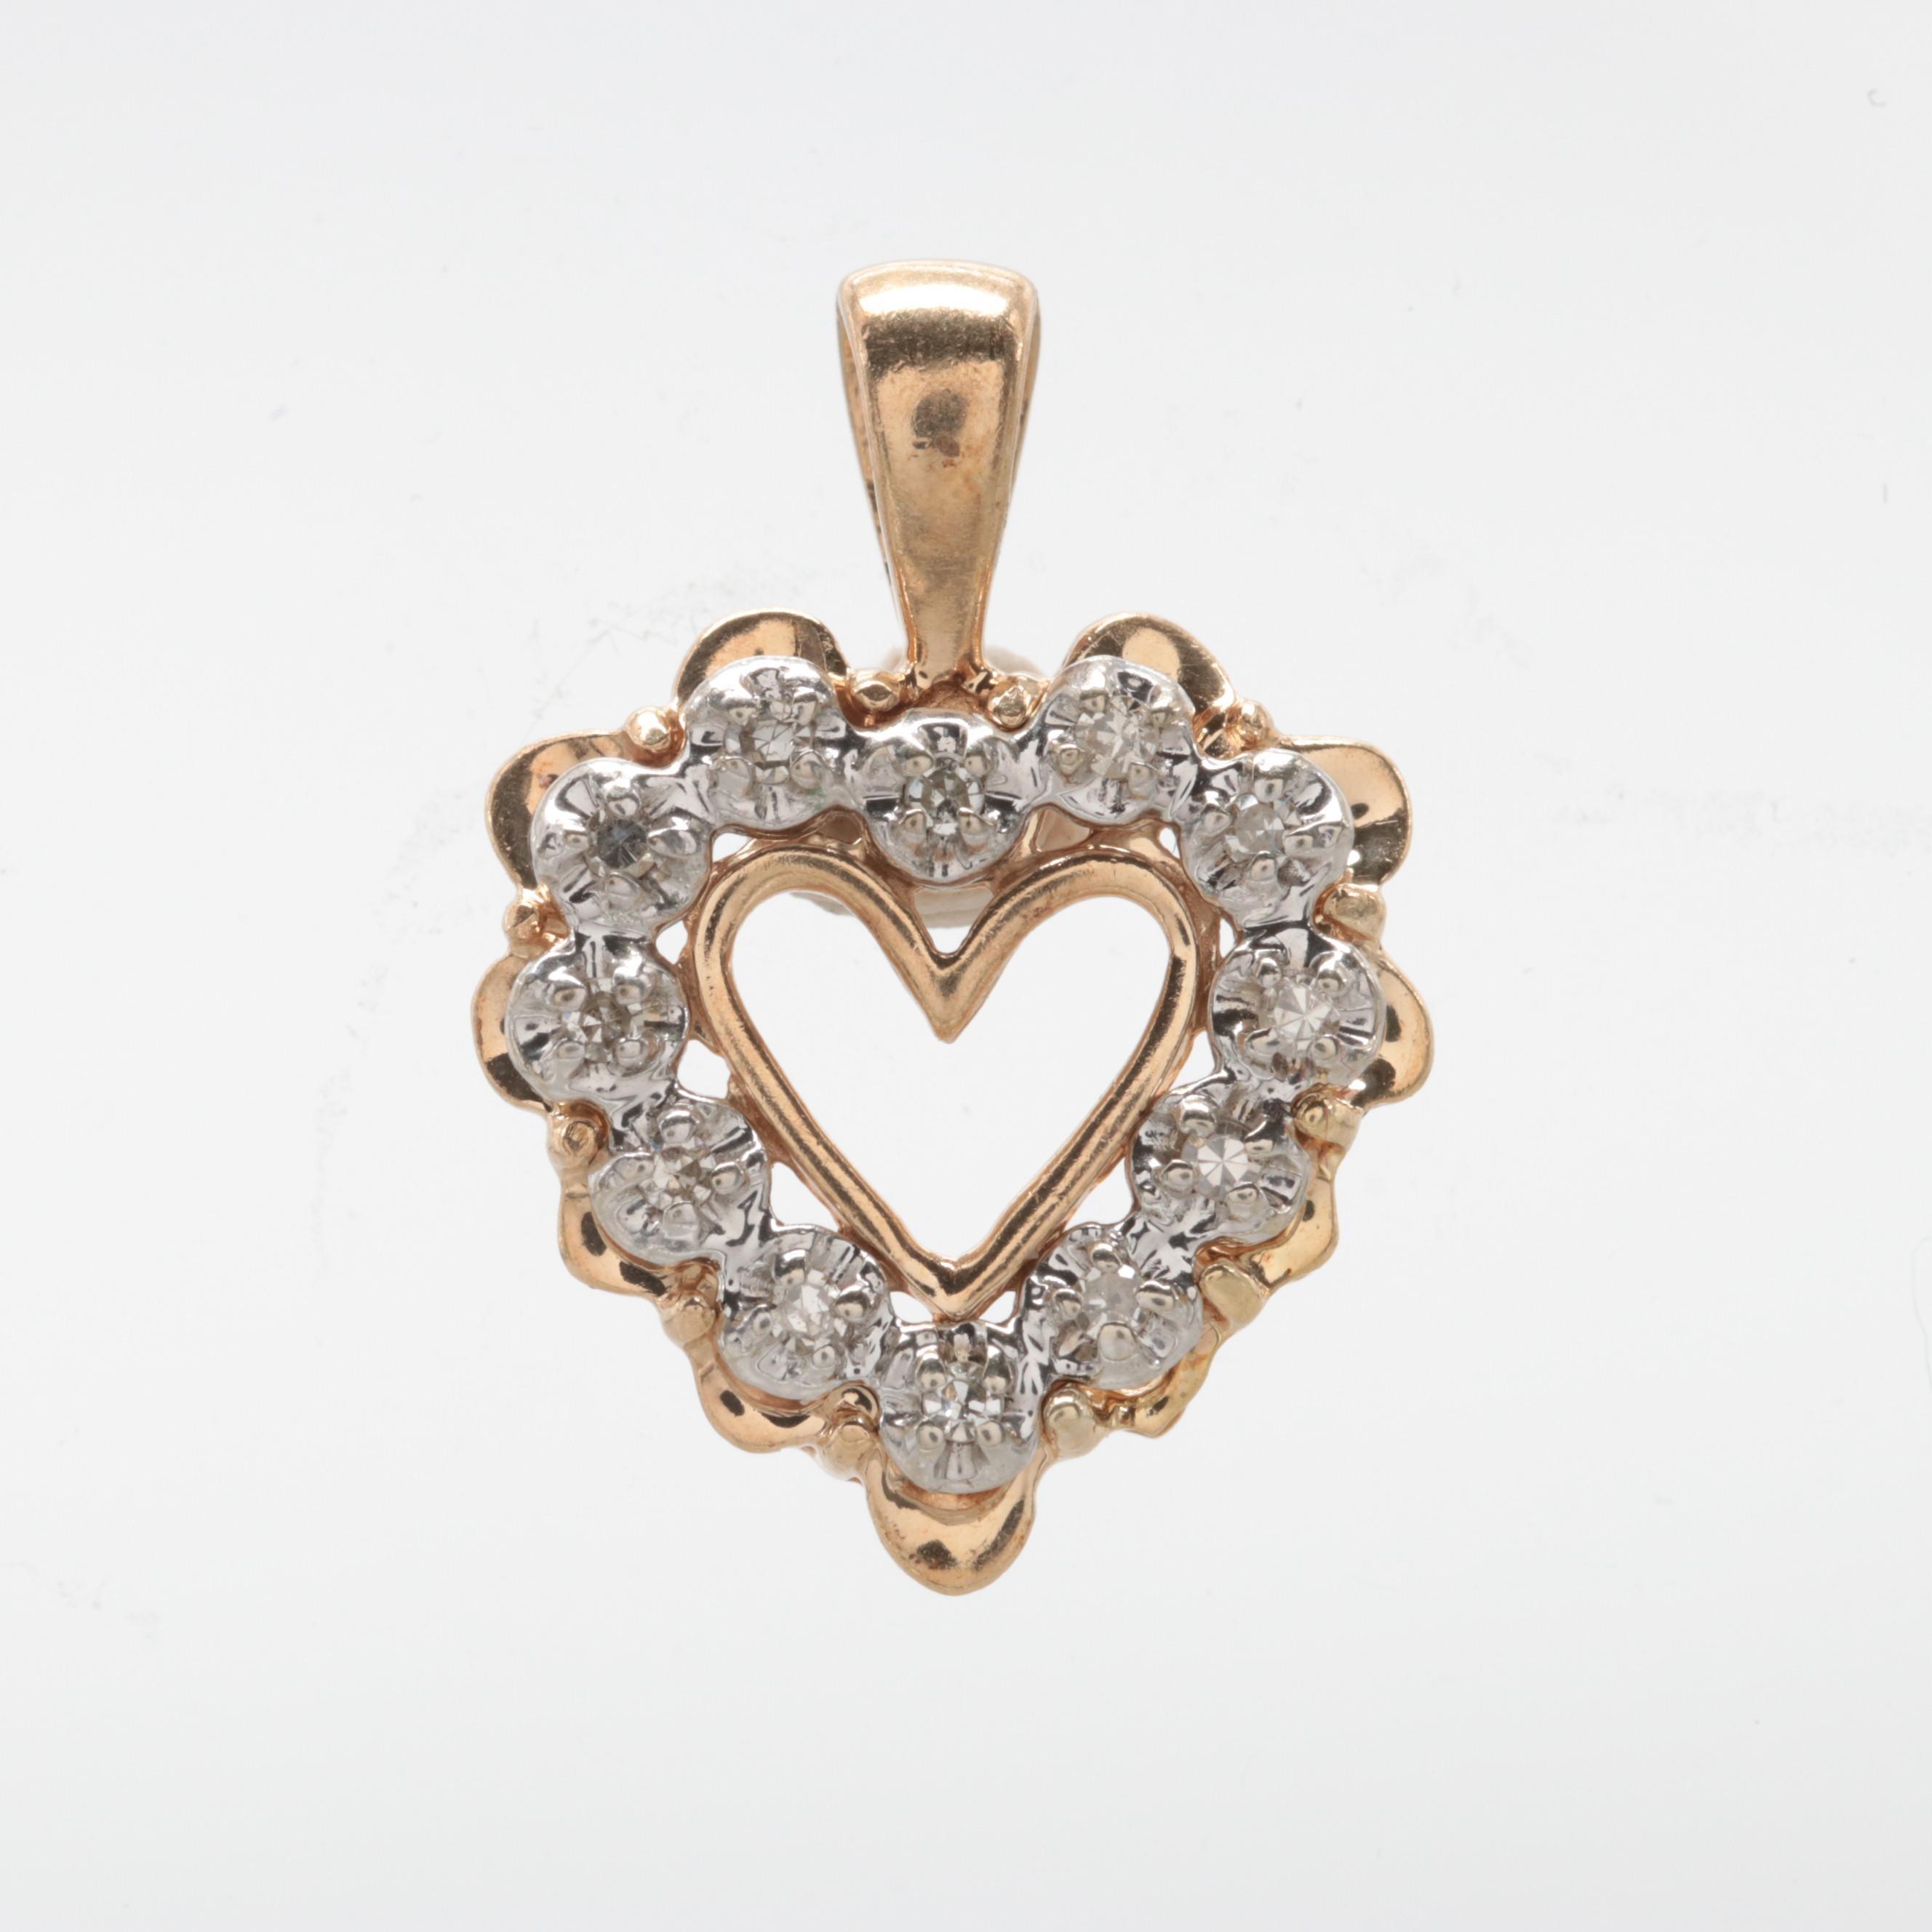 10K Yellow Gold Diamond Heart Pendant